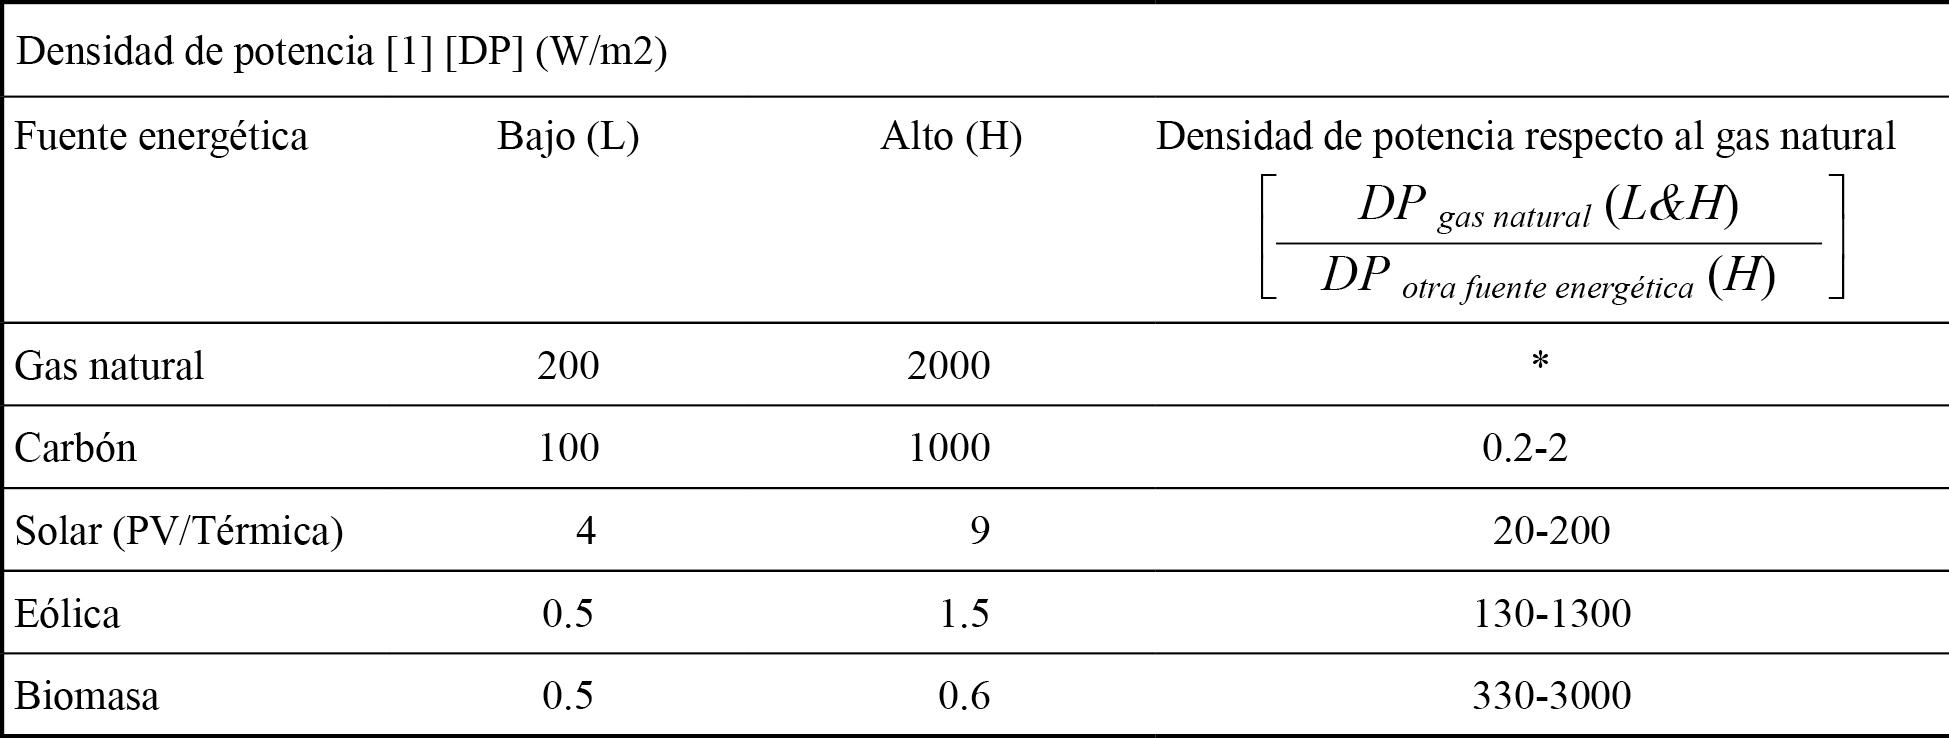 Densidad de potencia de diferentes fuentes energéticas (Smil, 2010)